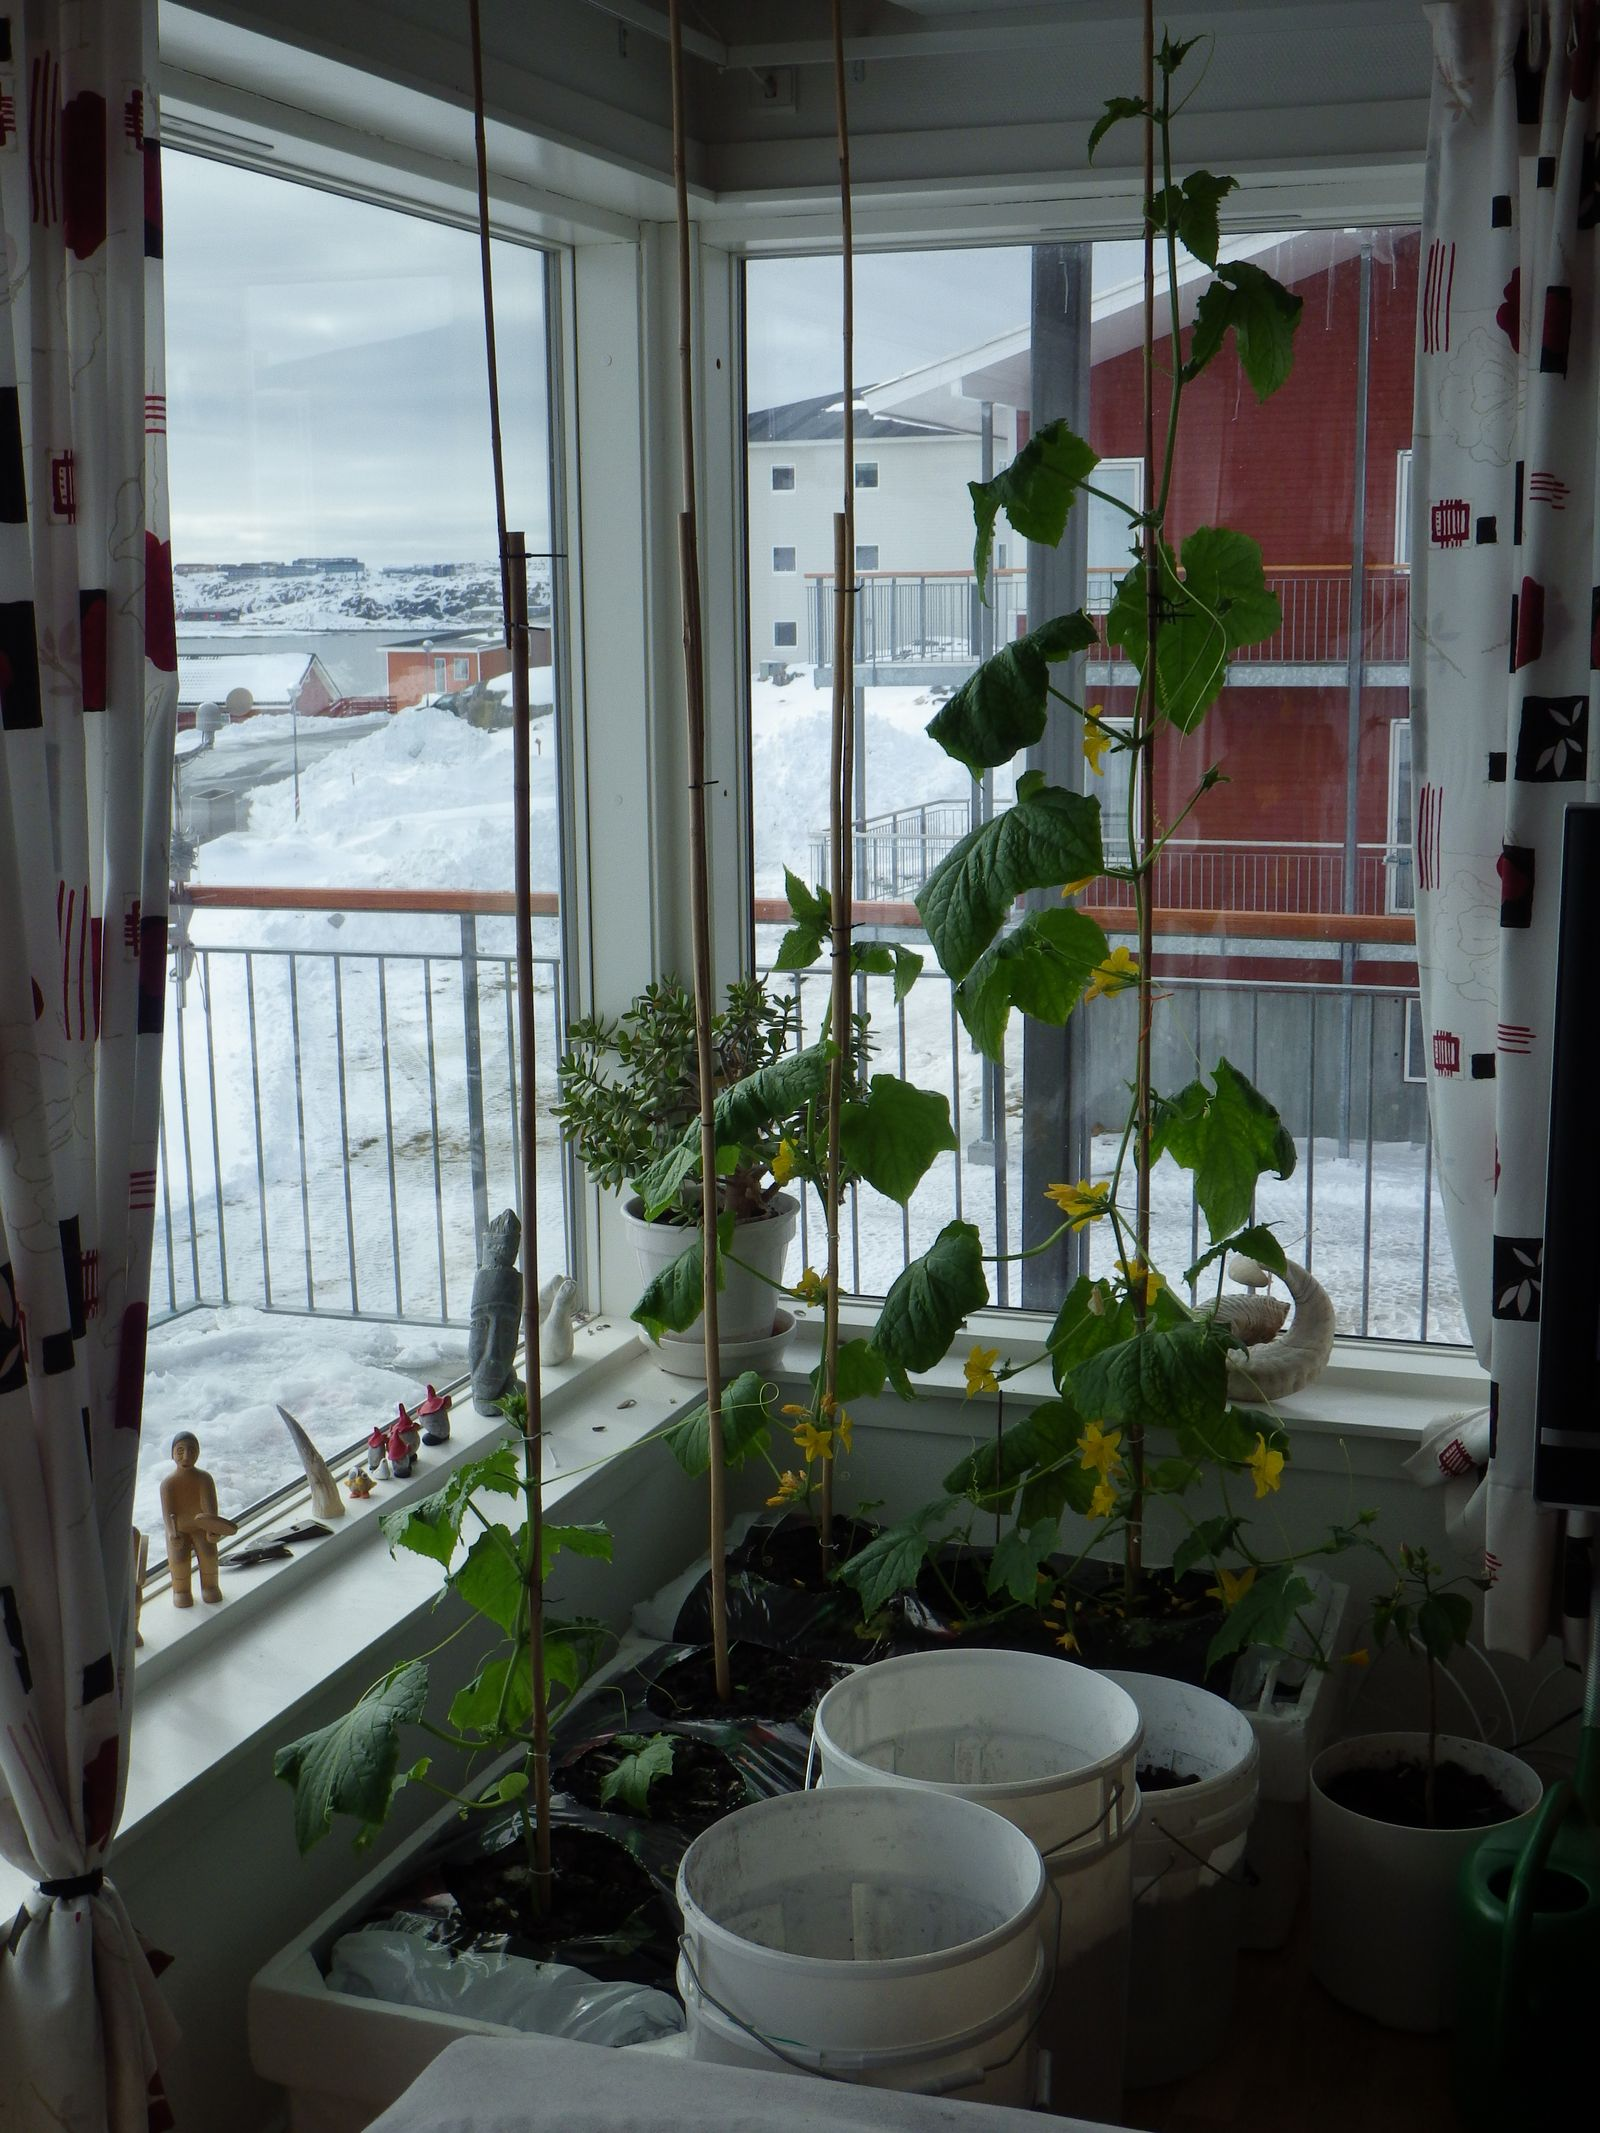 2014-04-24-1558_-_Agurkeplante_Kartofelspande_Planter